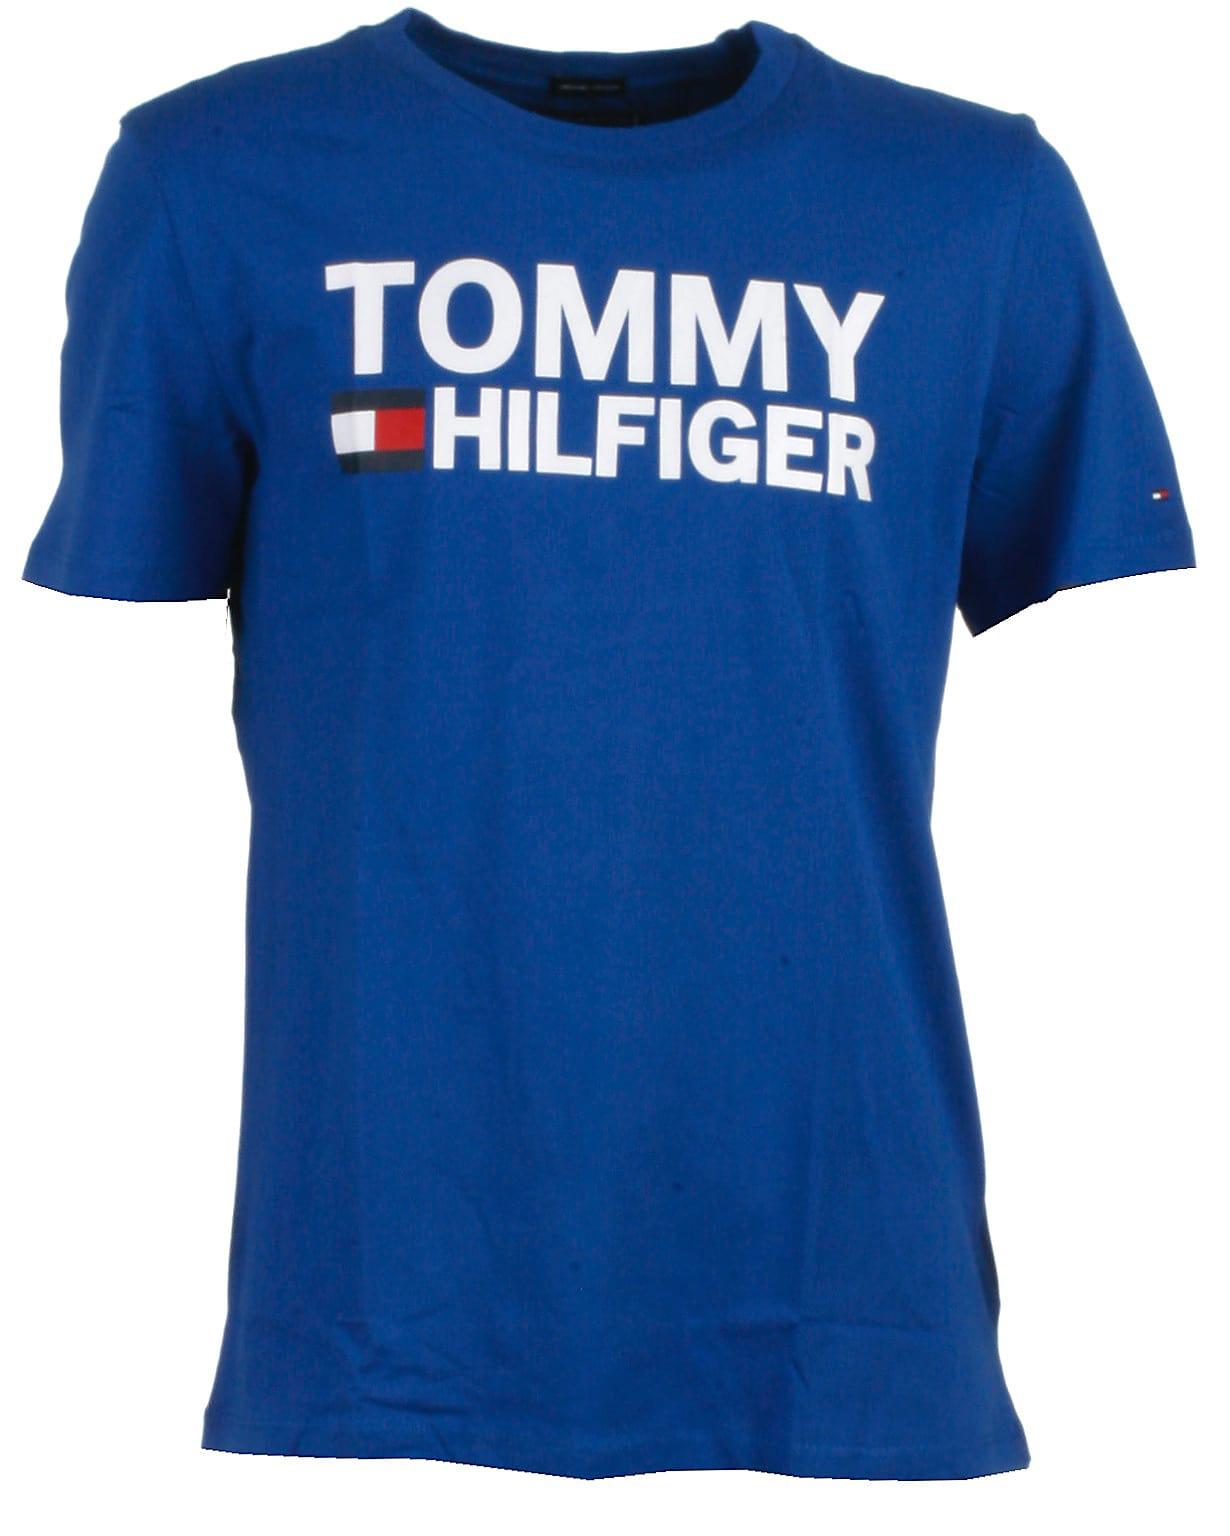 Tommy Hilfiger t-shirt s/s, blå, Essential